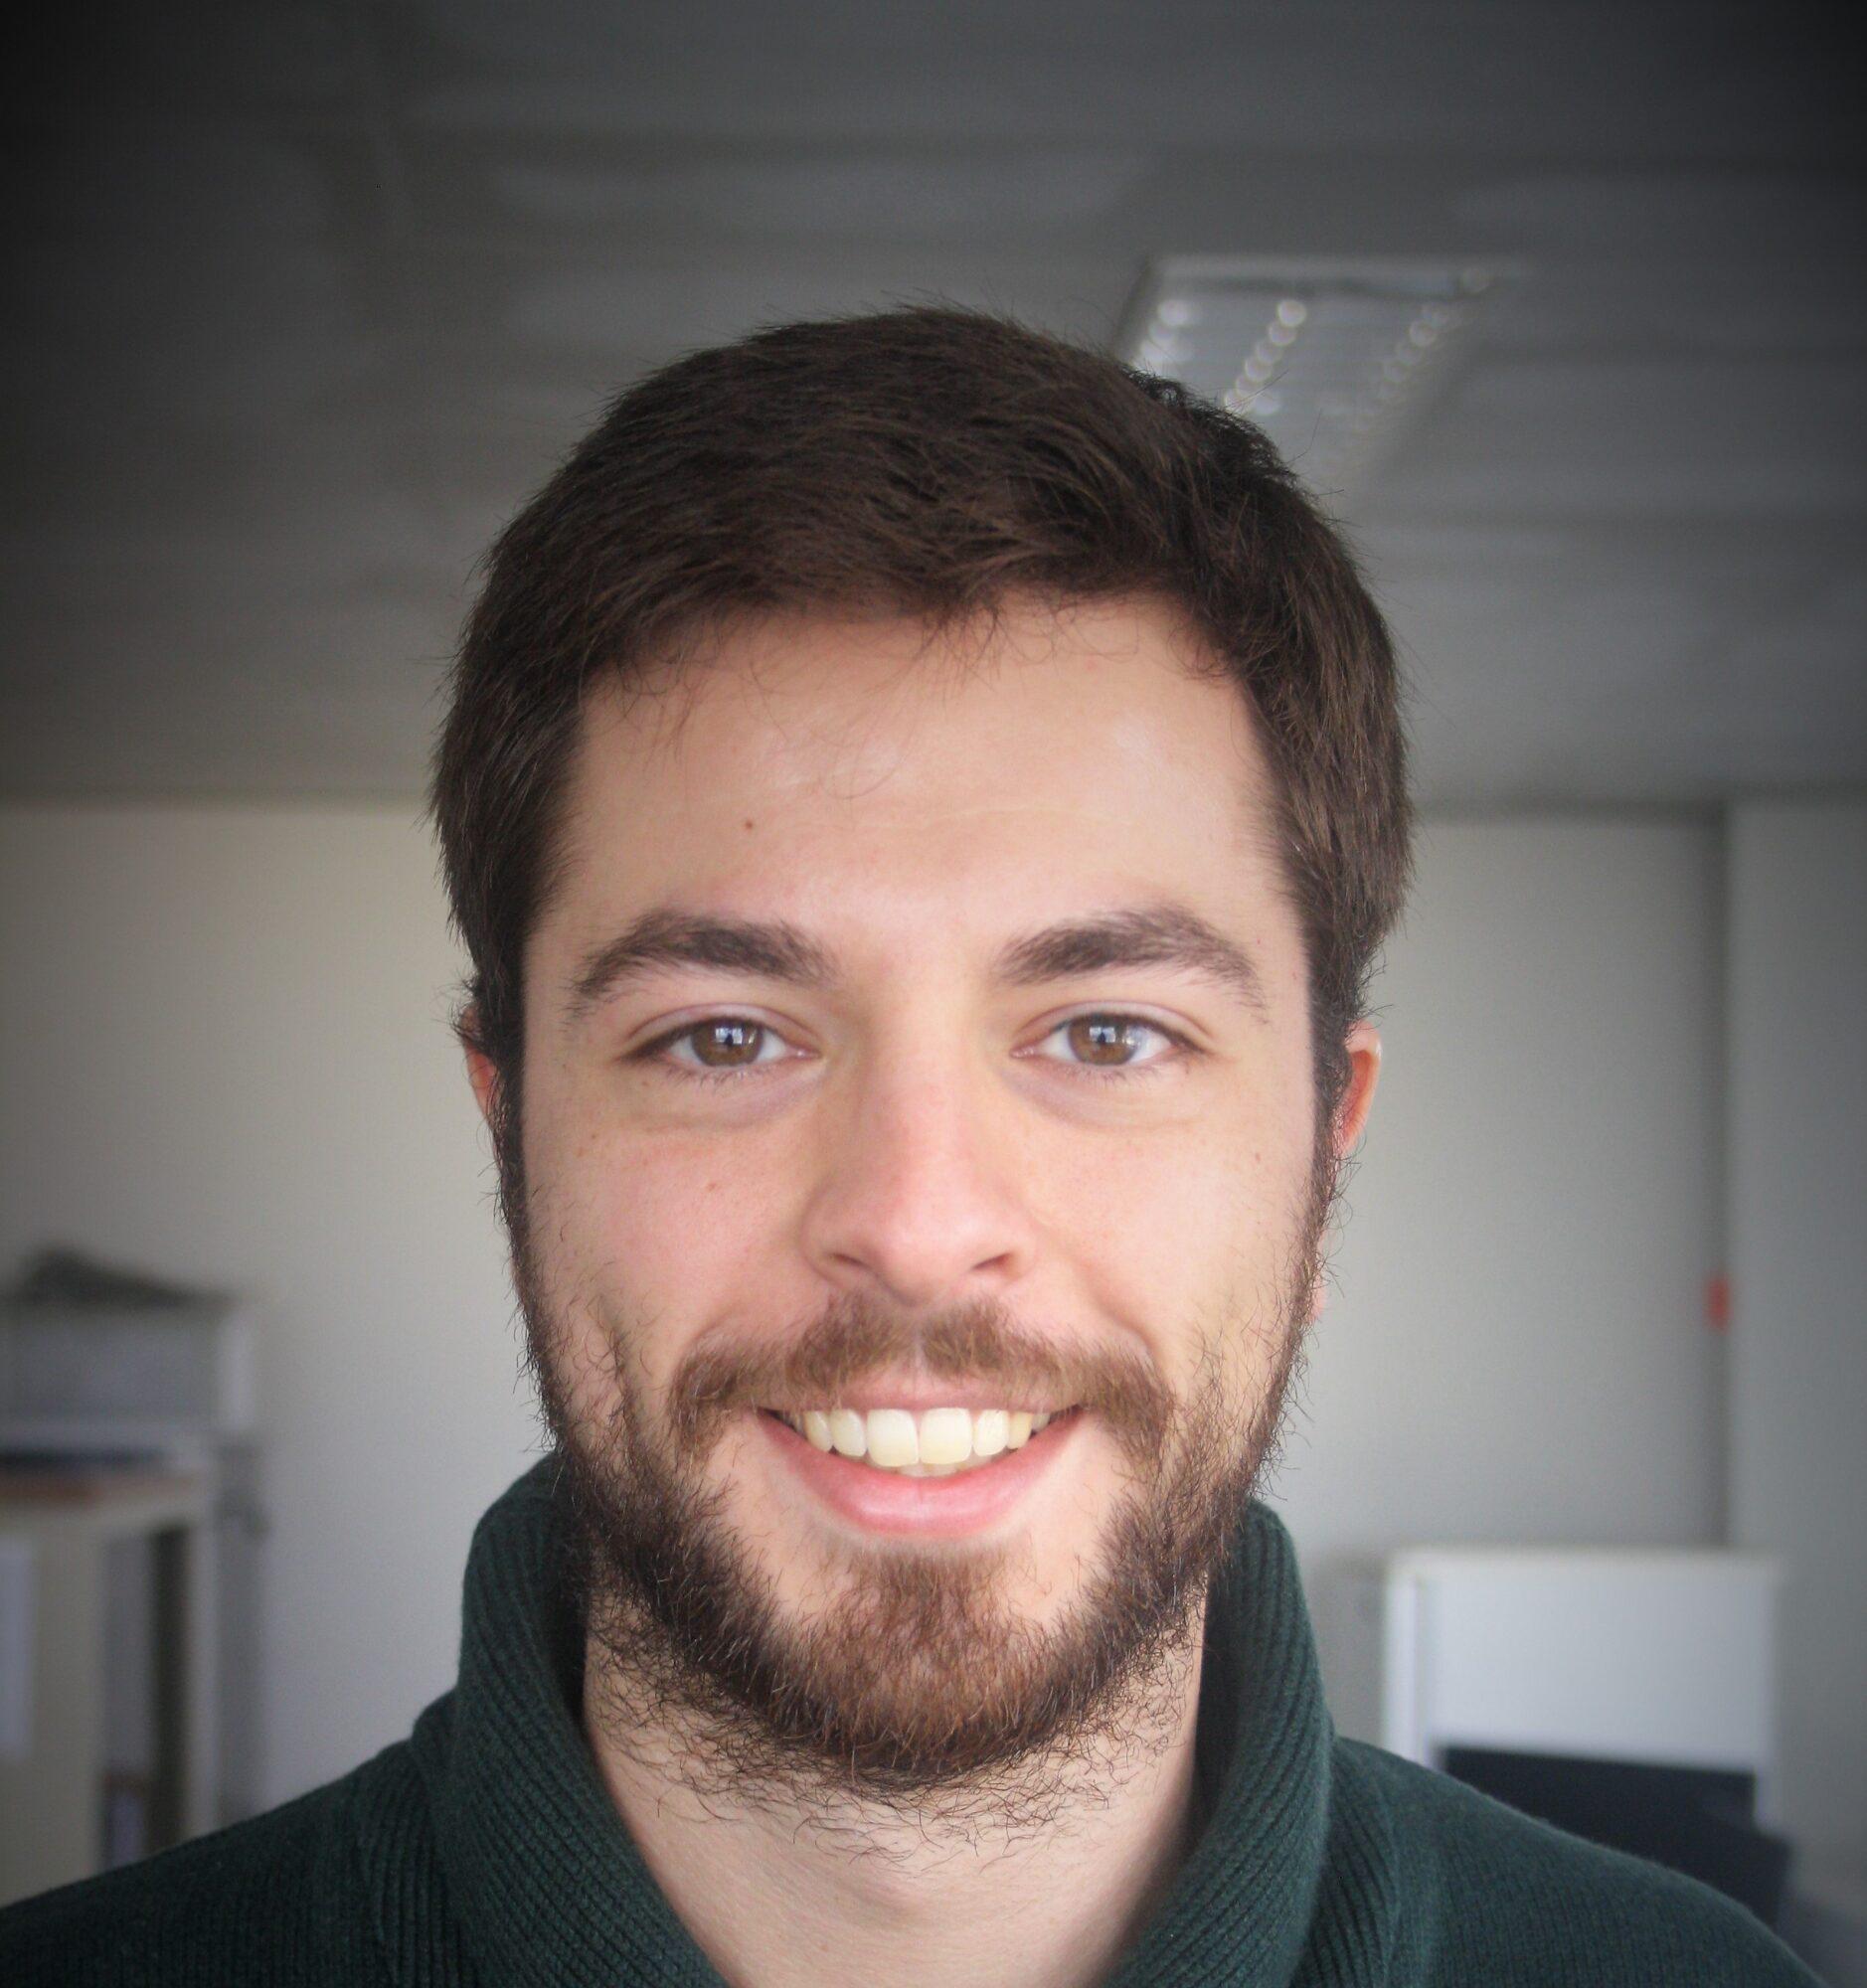 Rodolfo Abreu